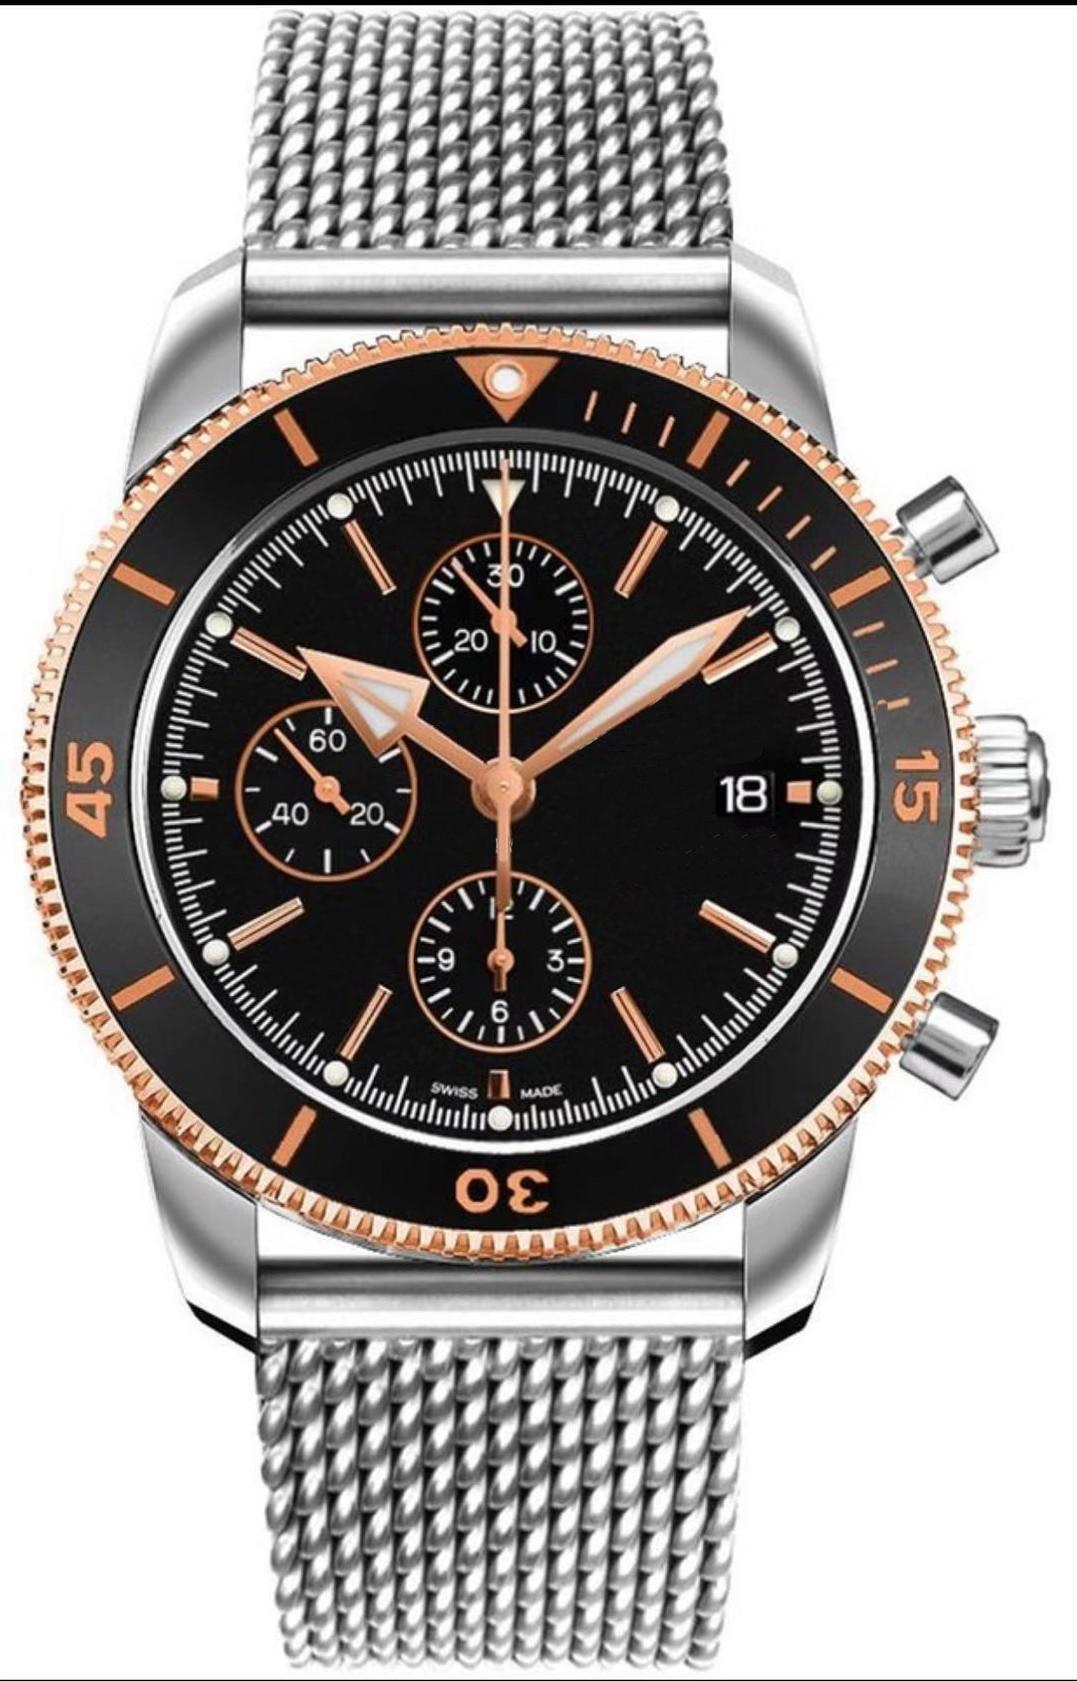 Luxury Brand New Quartz Chronograph Men Stopwatch Sapphire Crystal Japanese Rotatable Ceramic Bezel Sport Silver Rose Gold Watch